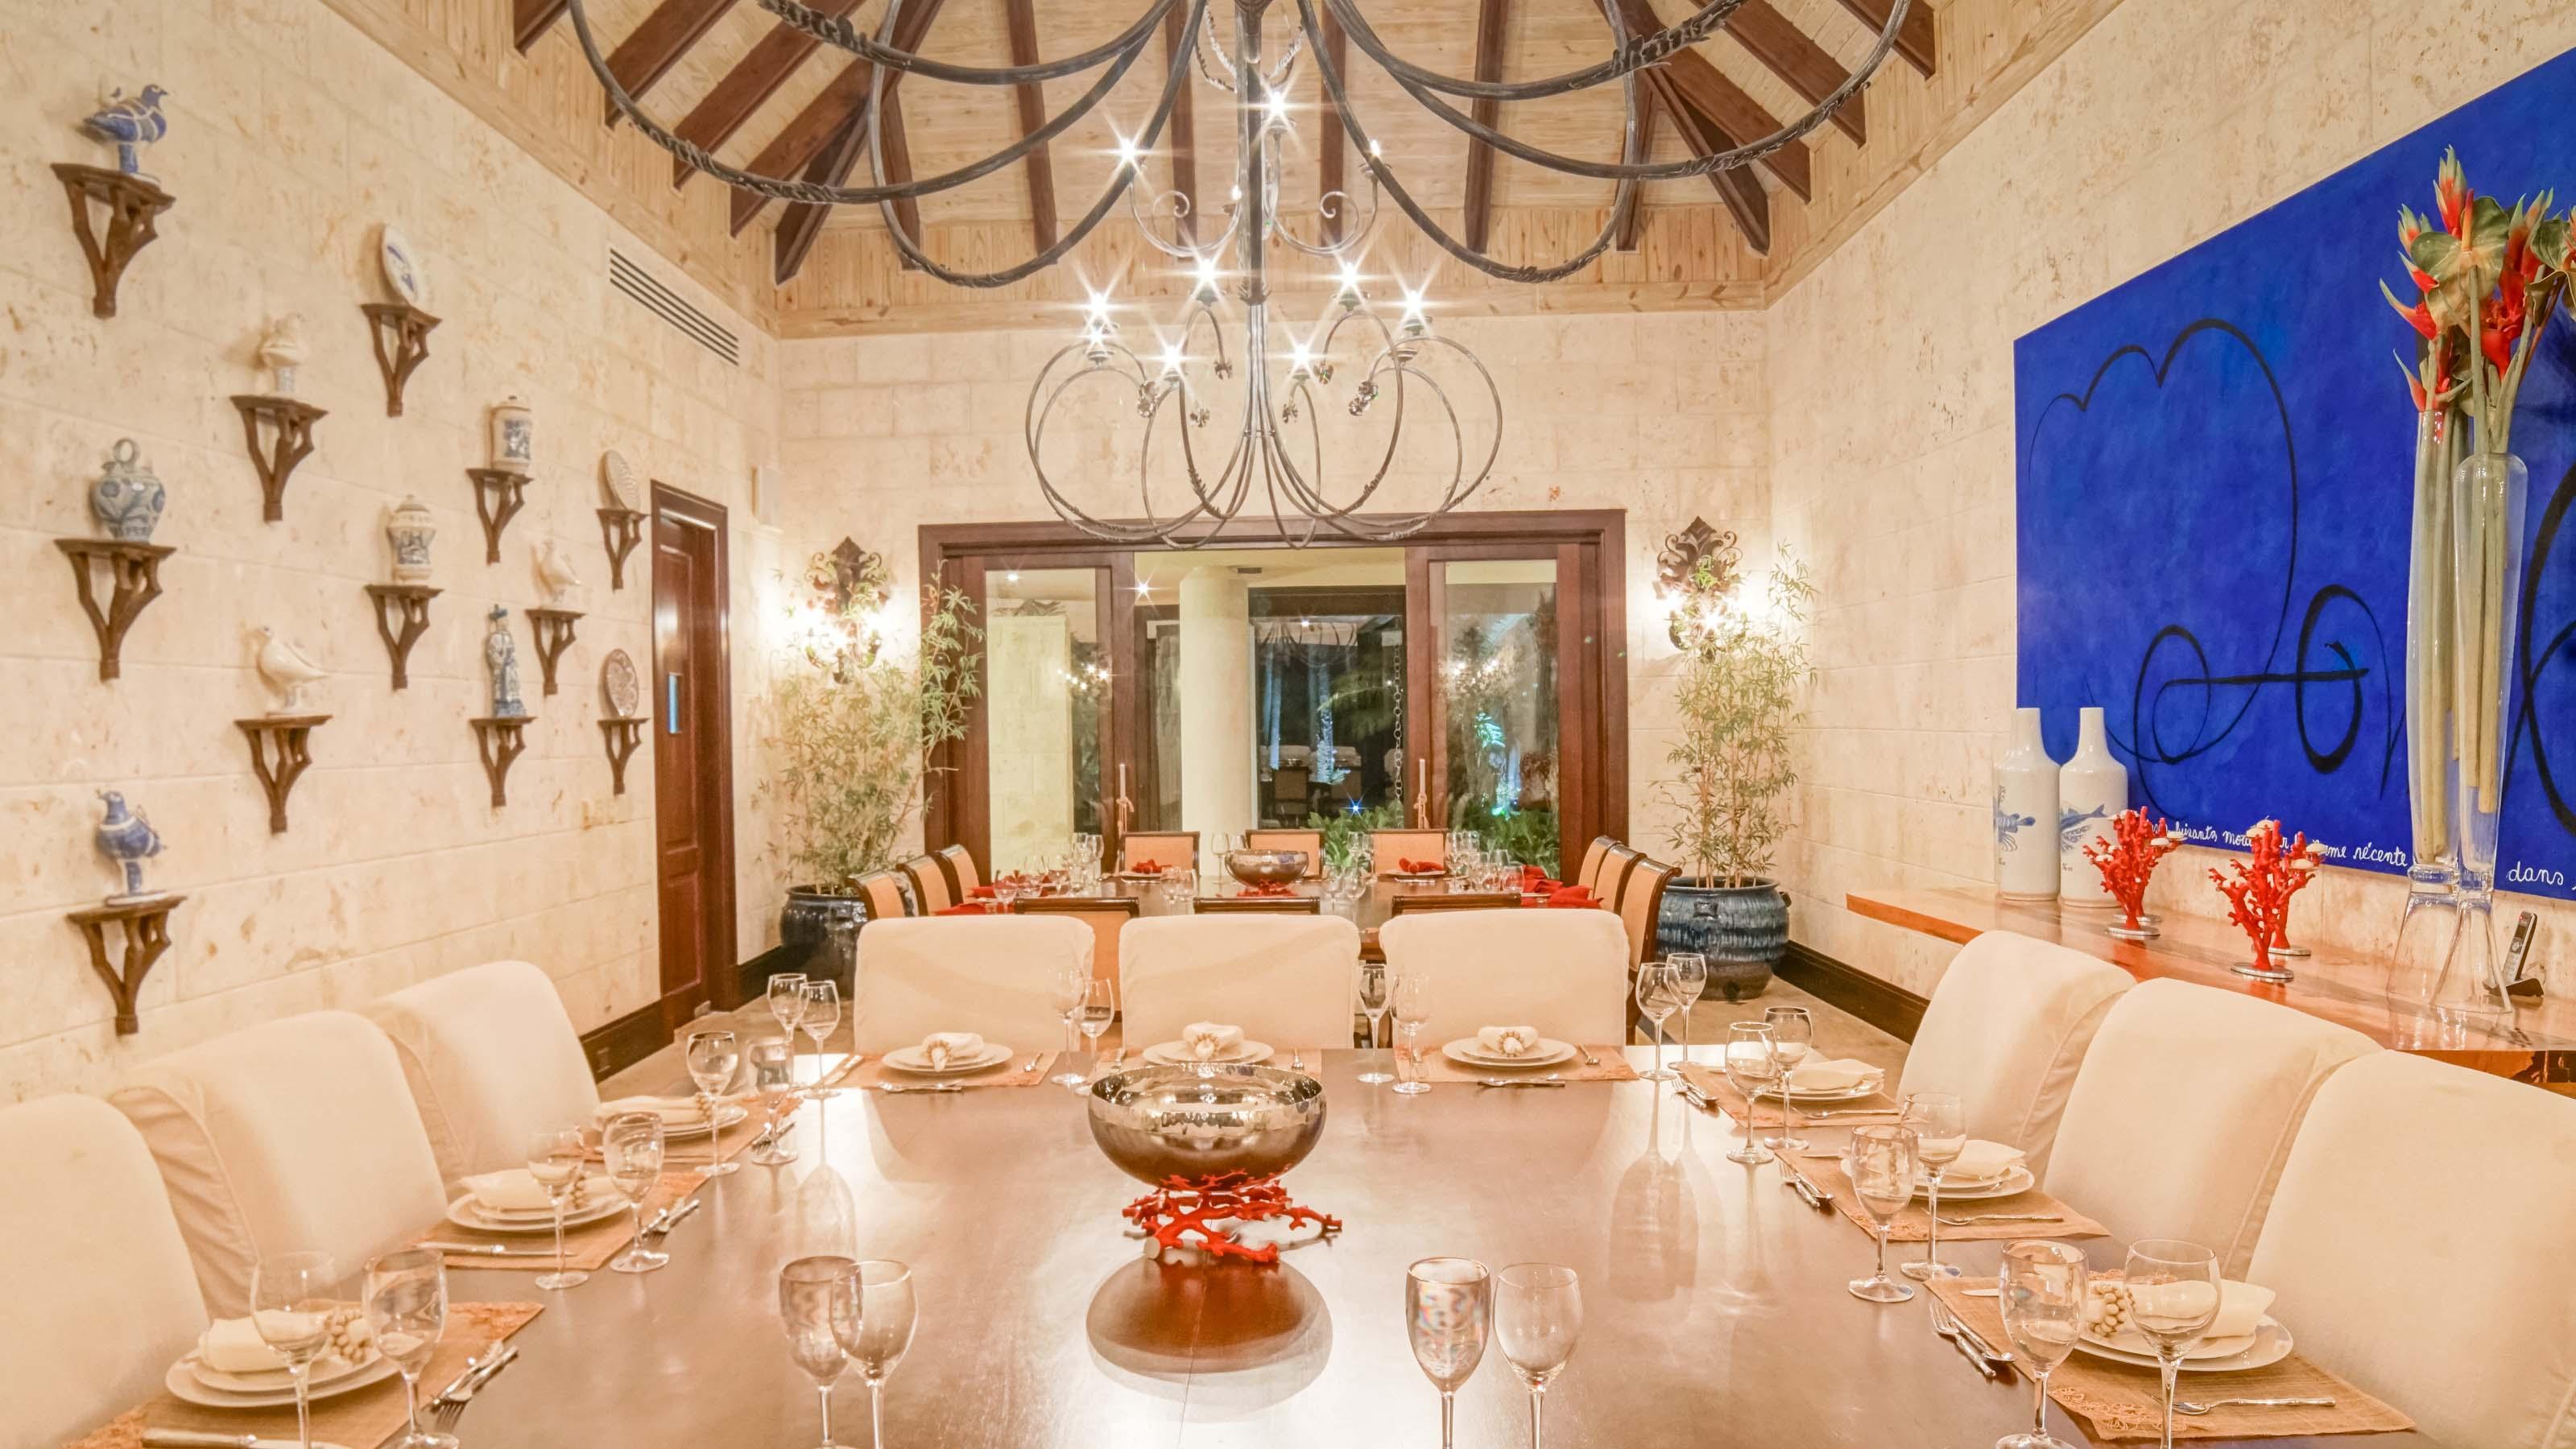 Dominican Republic - Casa De Campo – Sophisticated Villa with Elegance, Grace...